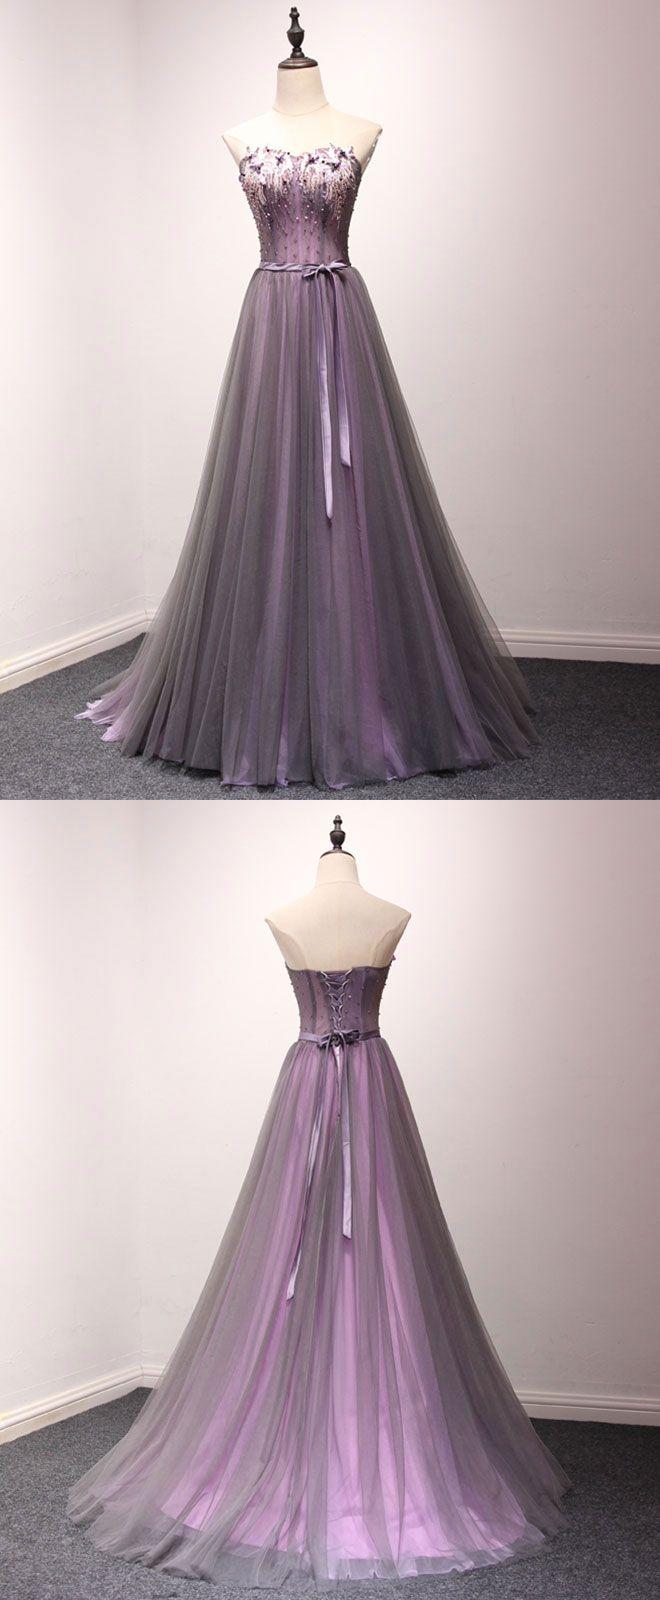 Pruple tulle sweetheart neck long prom dress evening dress long